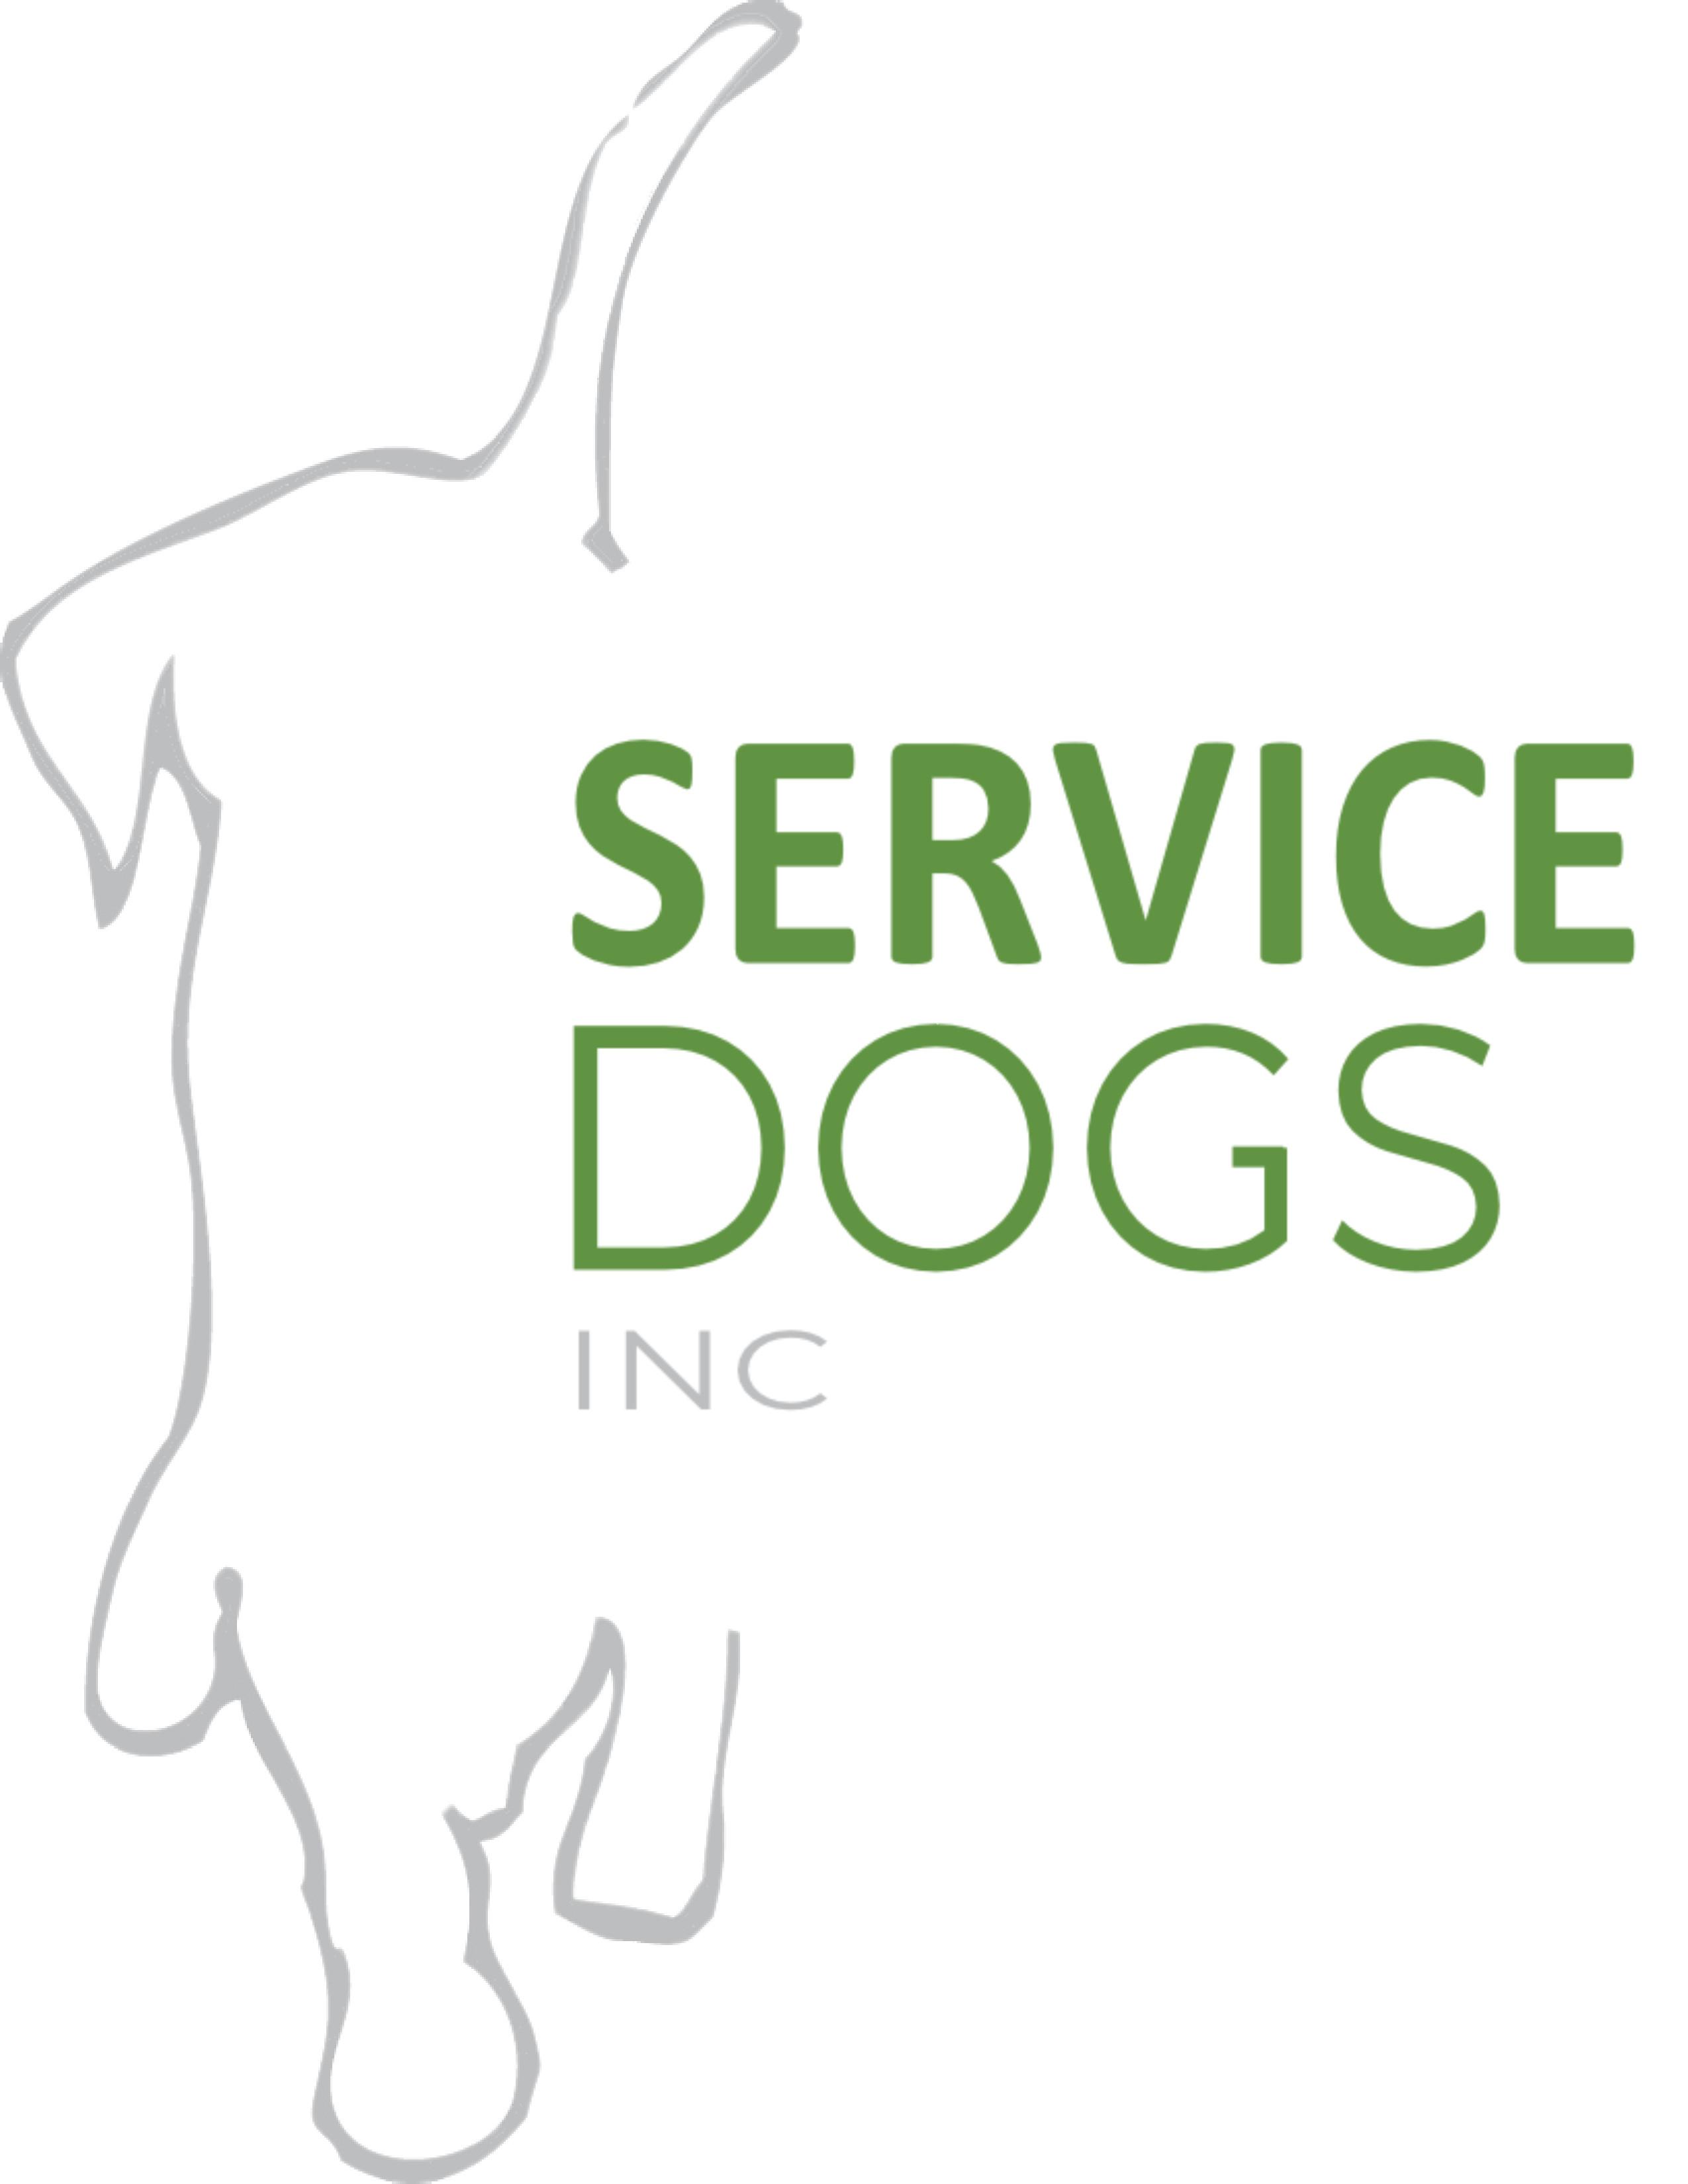 Service Dogs Inc.